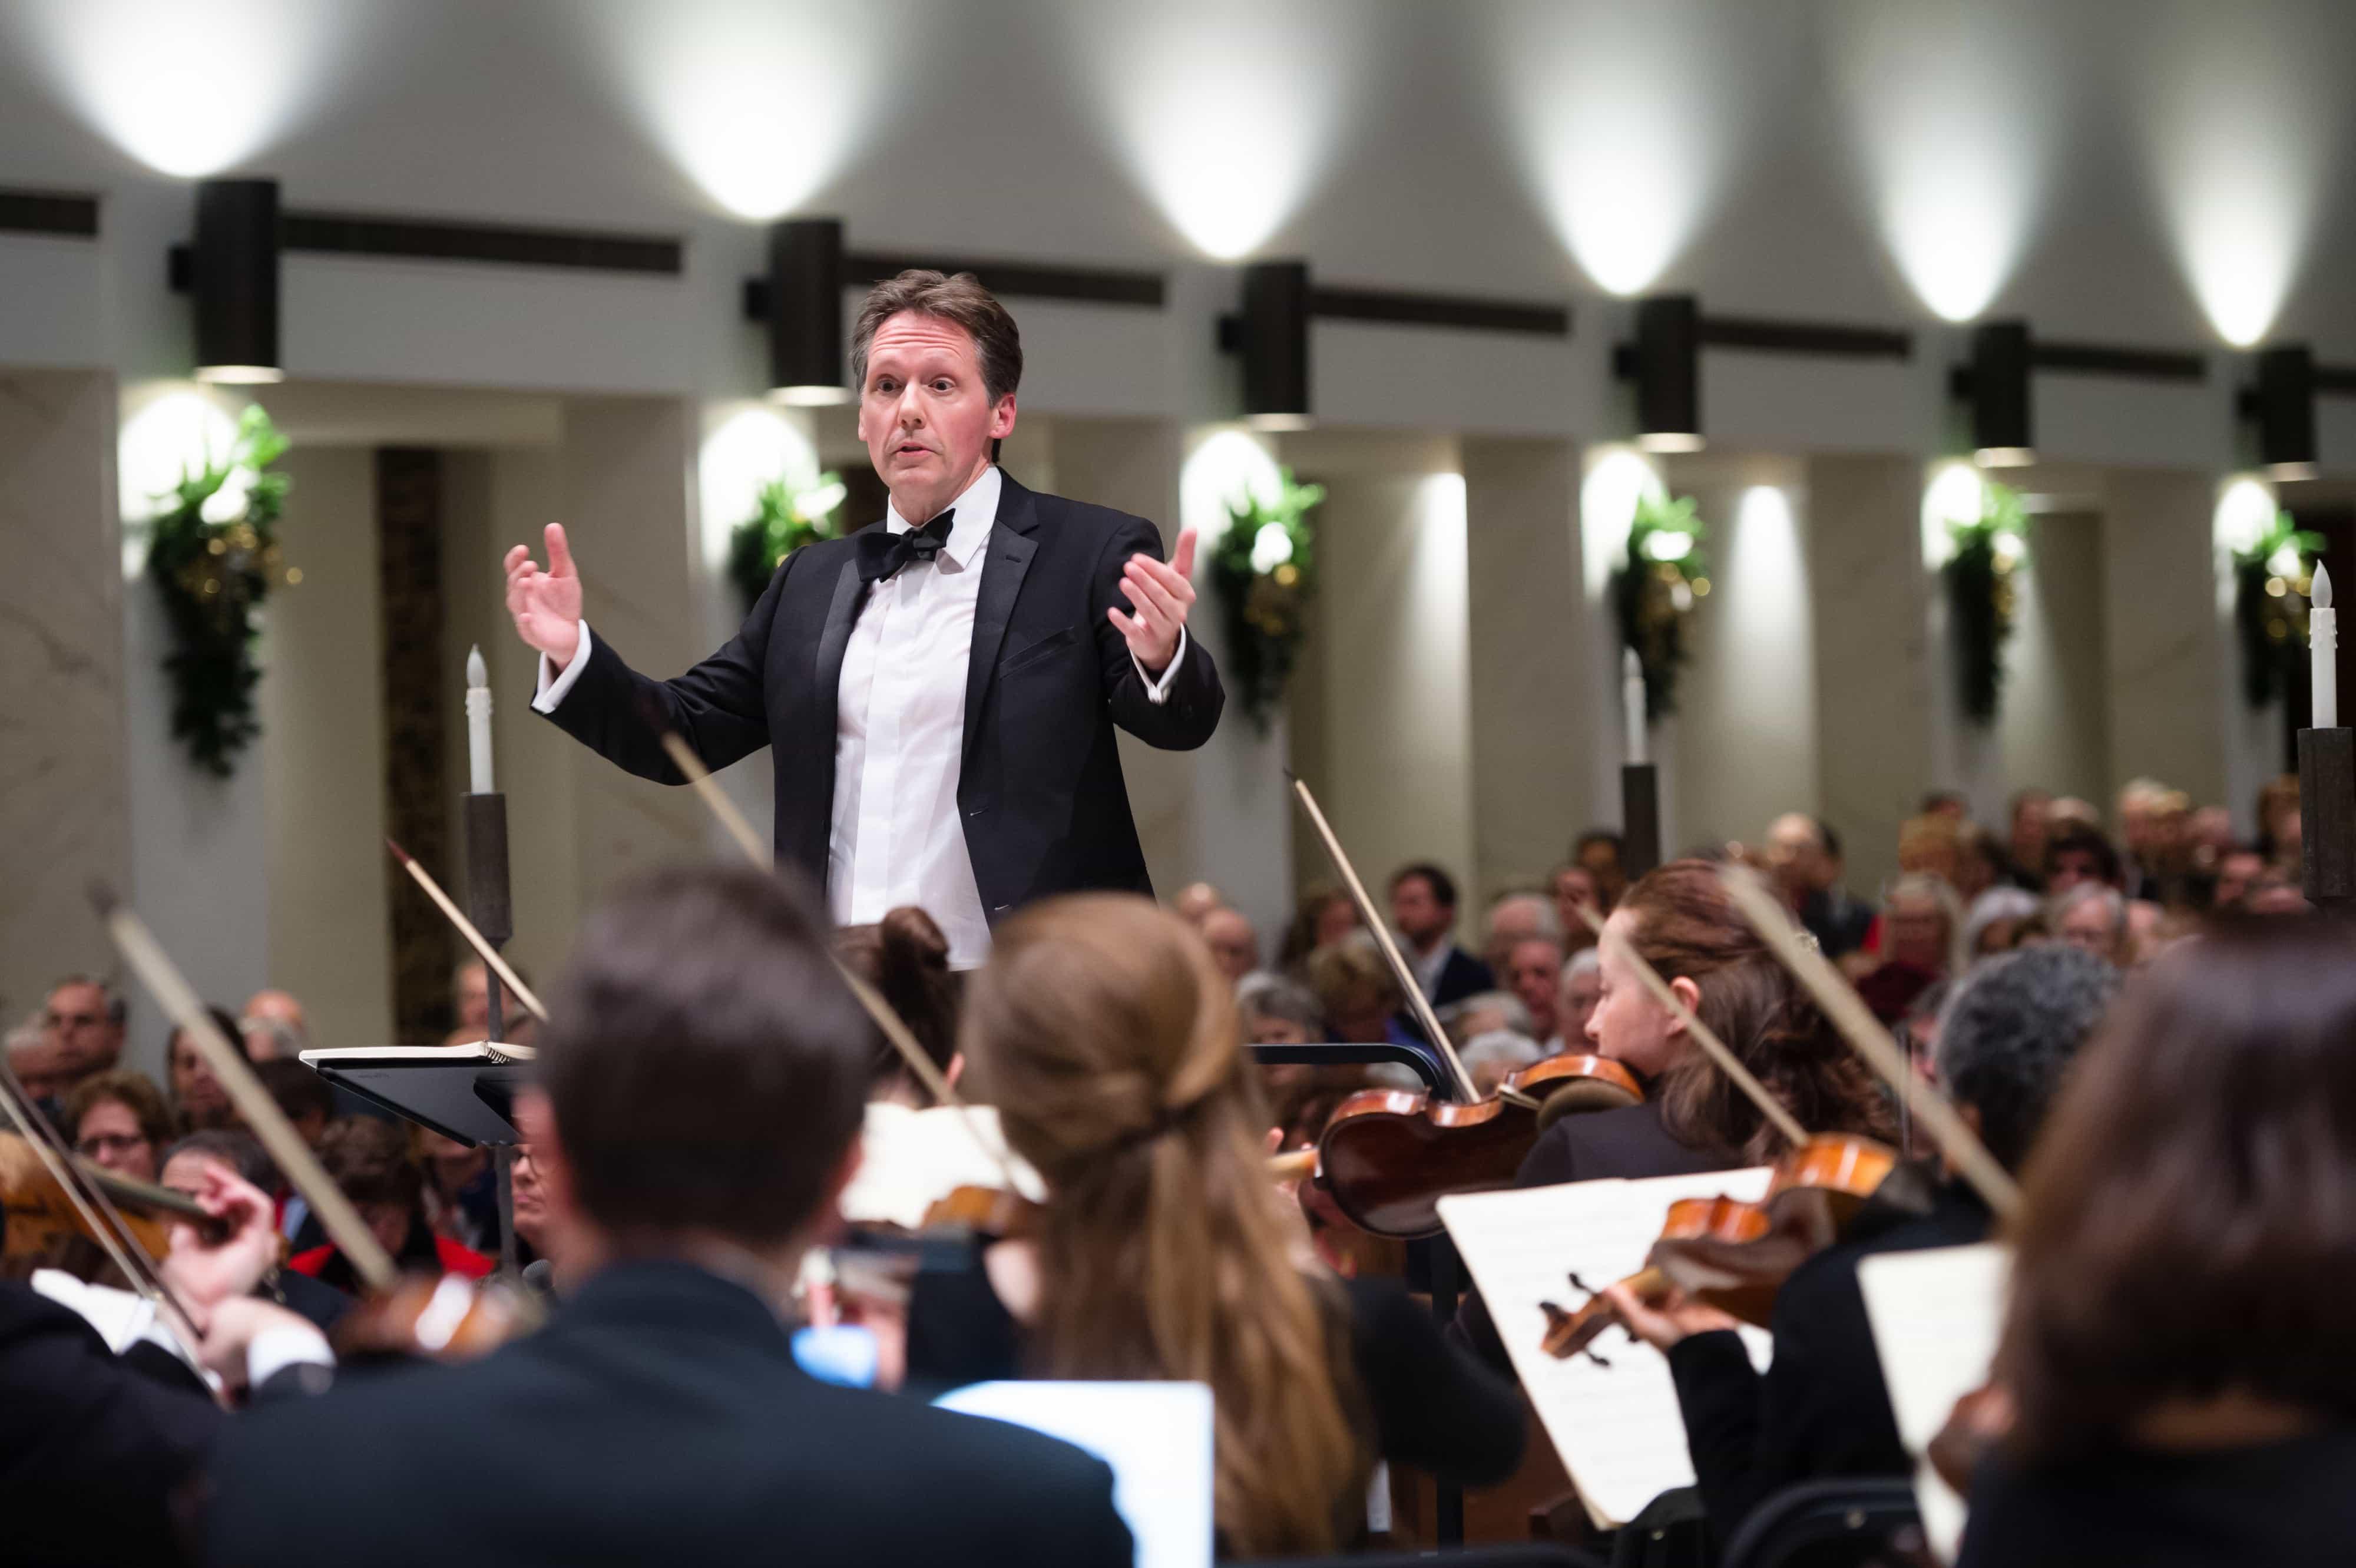 Dr. Dana Marsh, the Washington Bach Consort's new Artistic Director. Photo by David Betts, Metropolitan Photography.